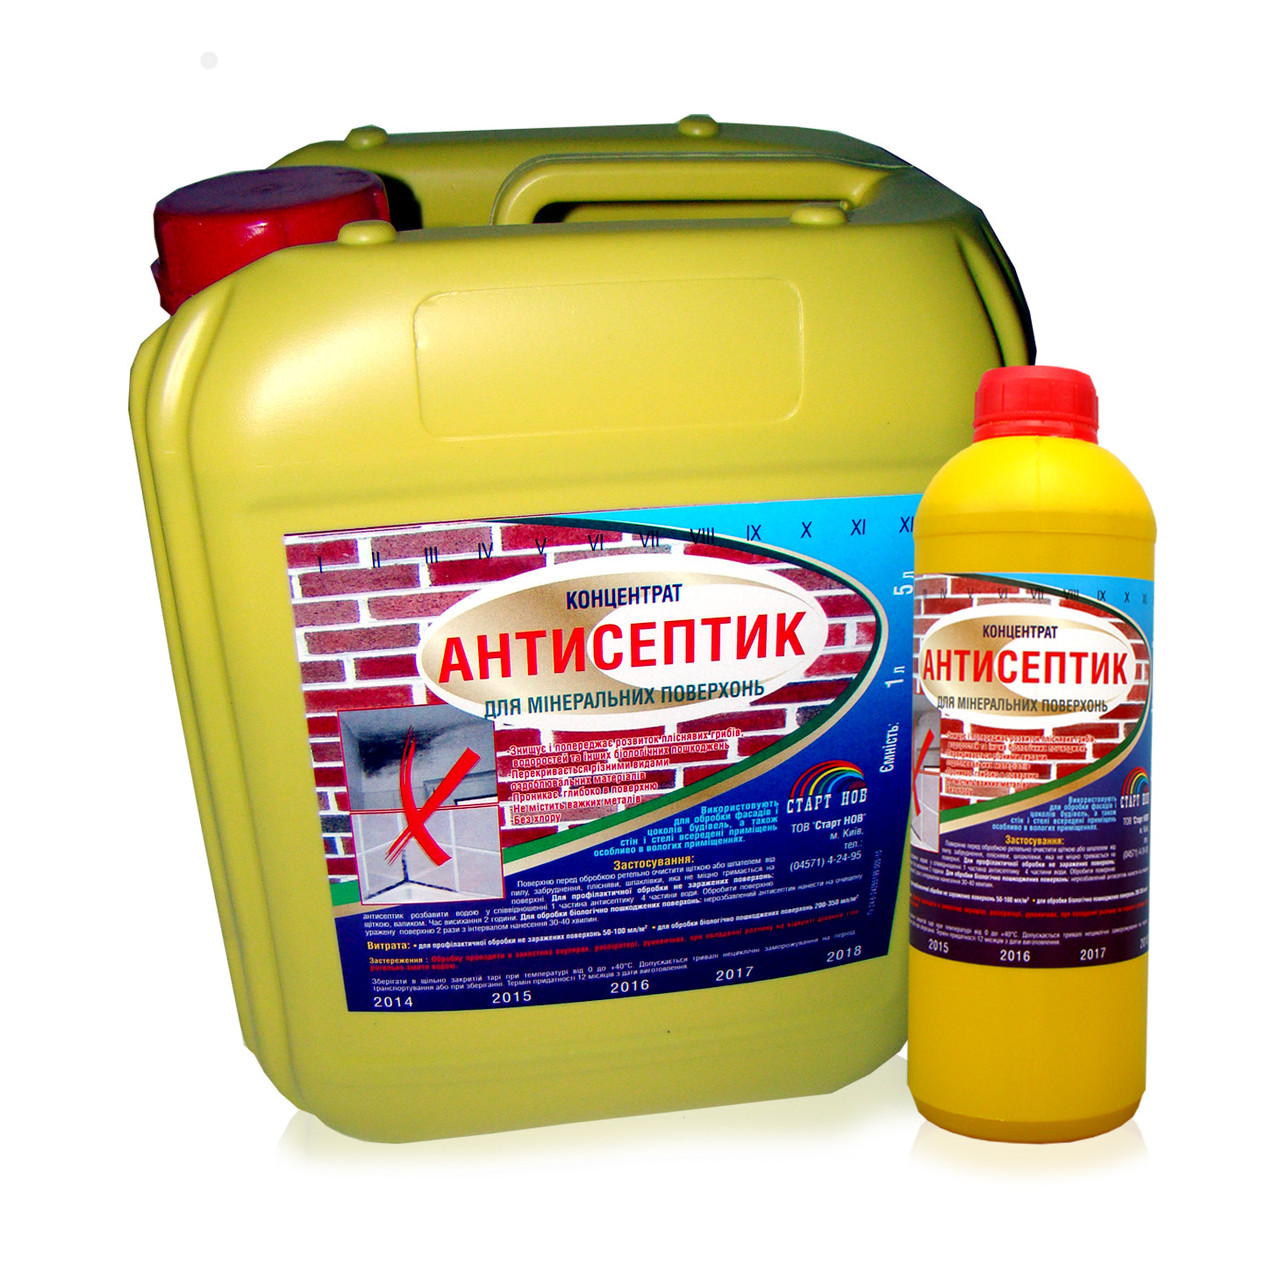 Антисептик для мінеральних поверхонь 1л Старт Нов